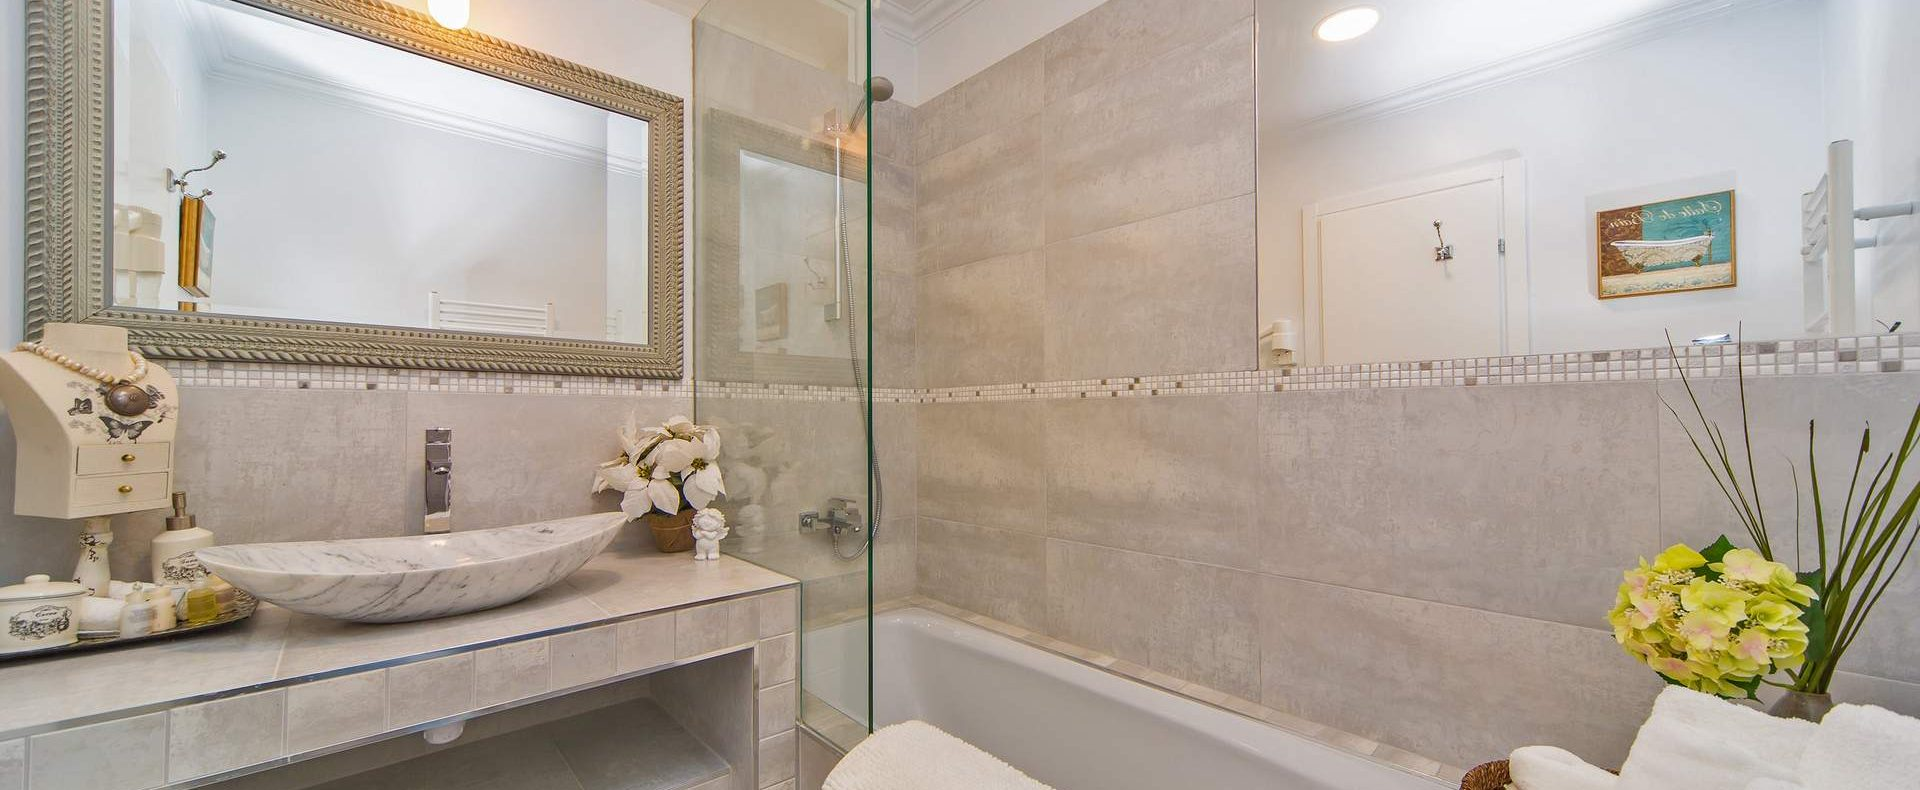 Dubrovnik villa bathroom